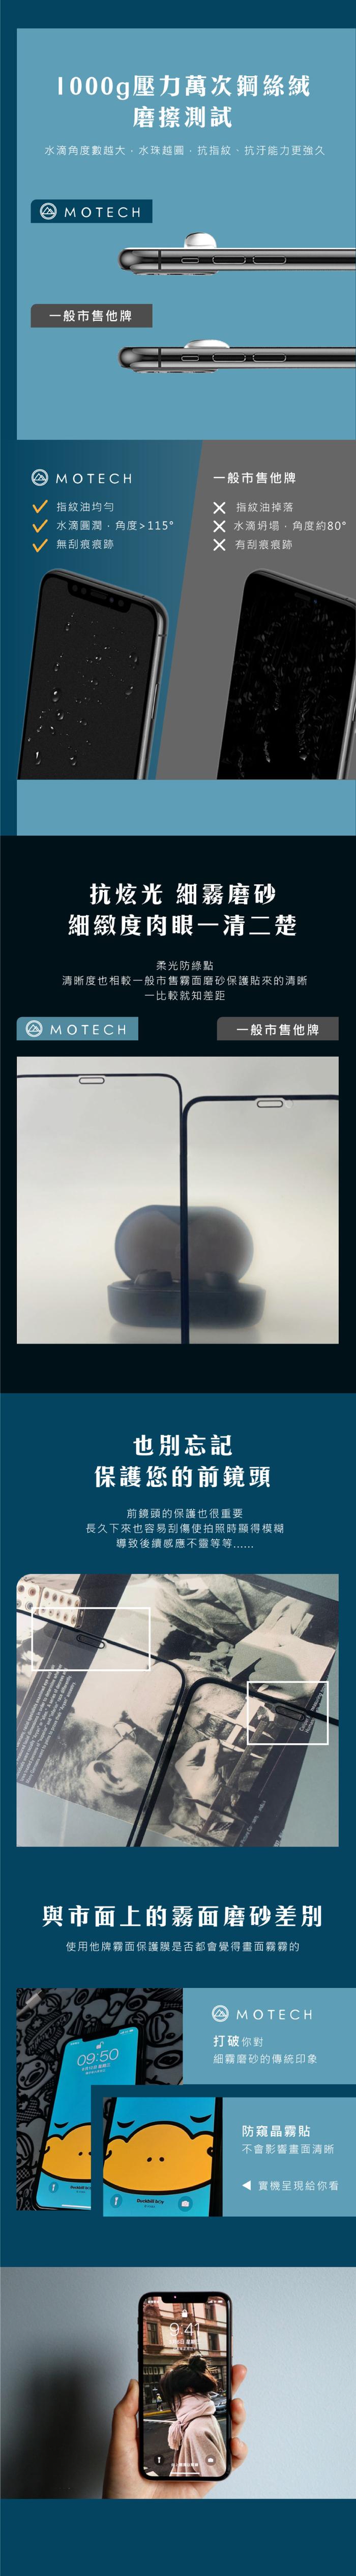 MOTECH 【獨家專利】 防窺晶霧貼 超細高透 防窺專用 iPhone 保護貼